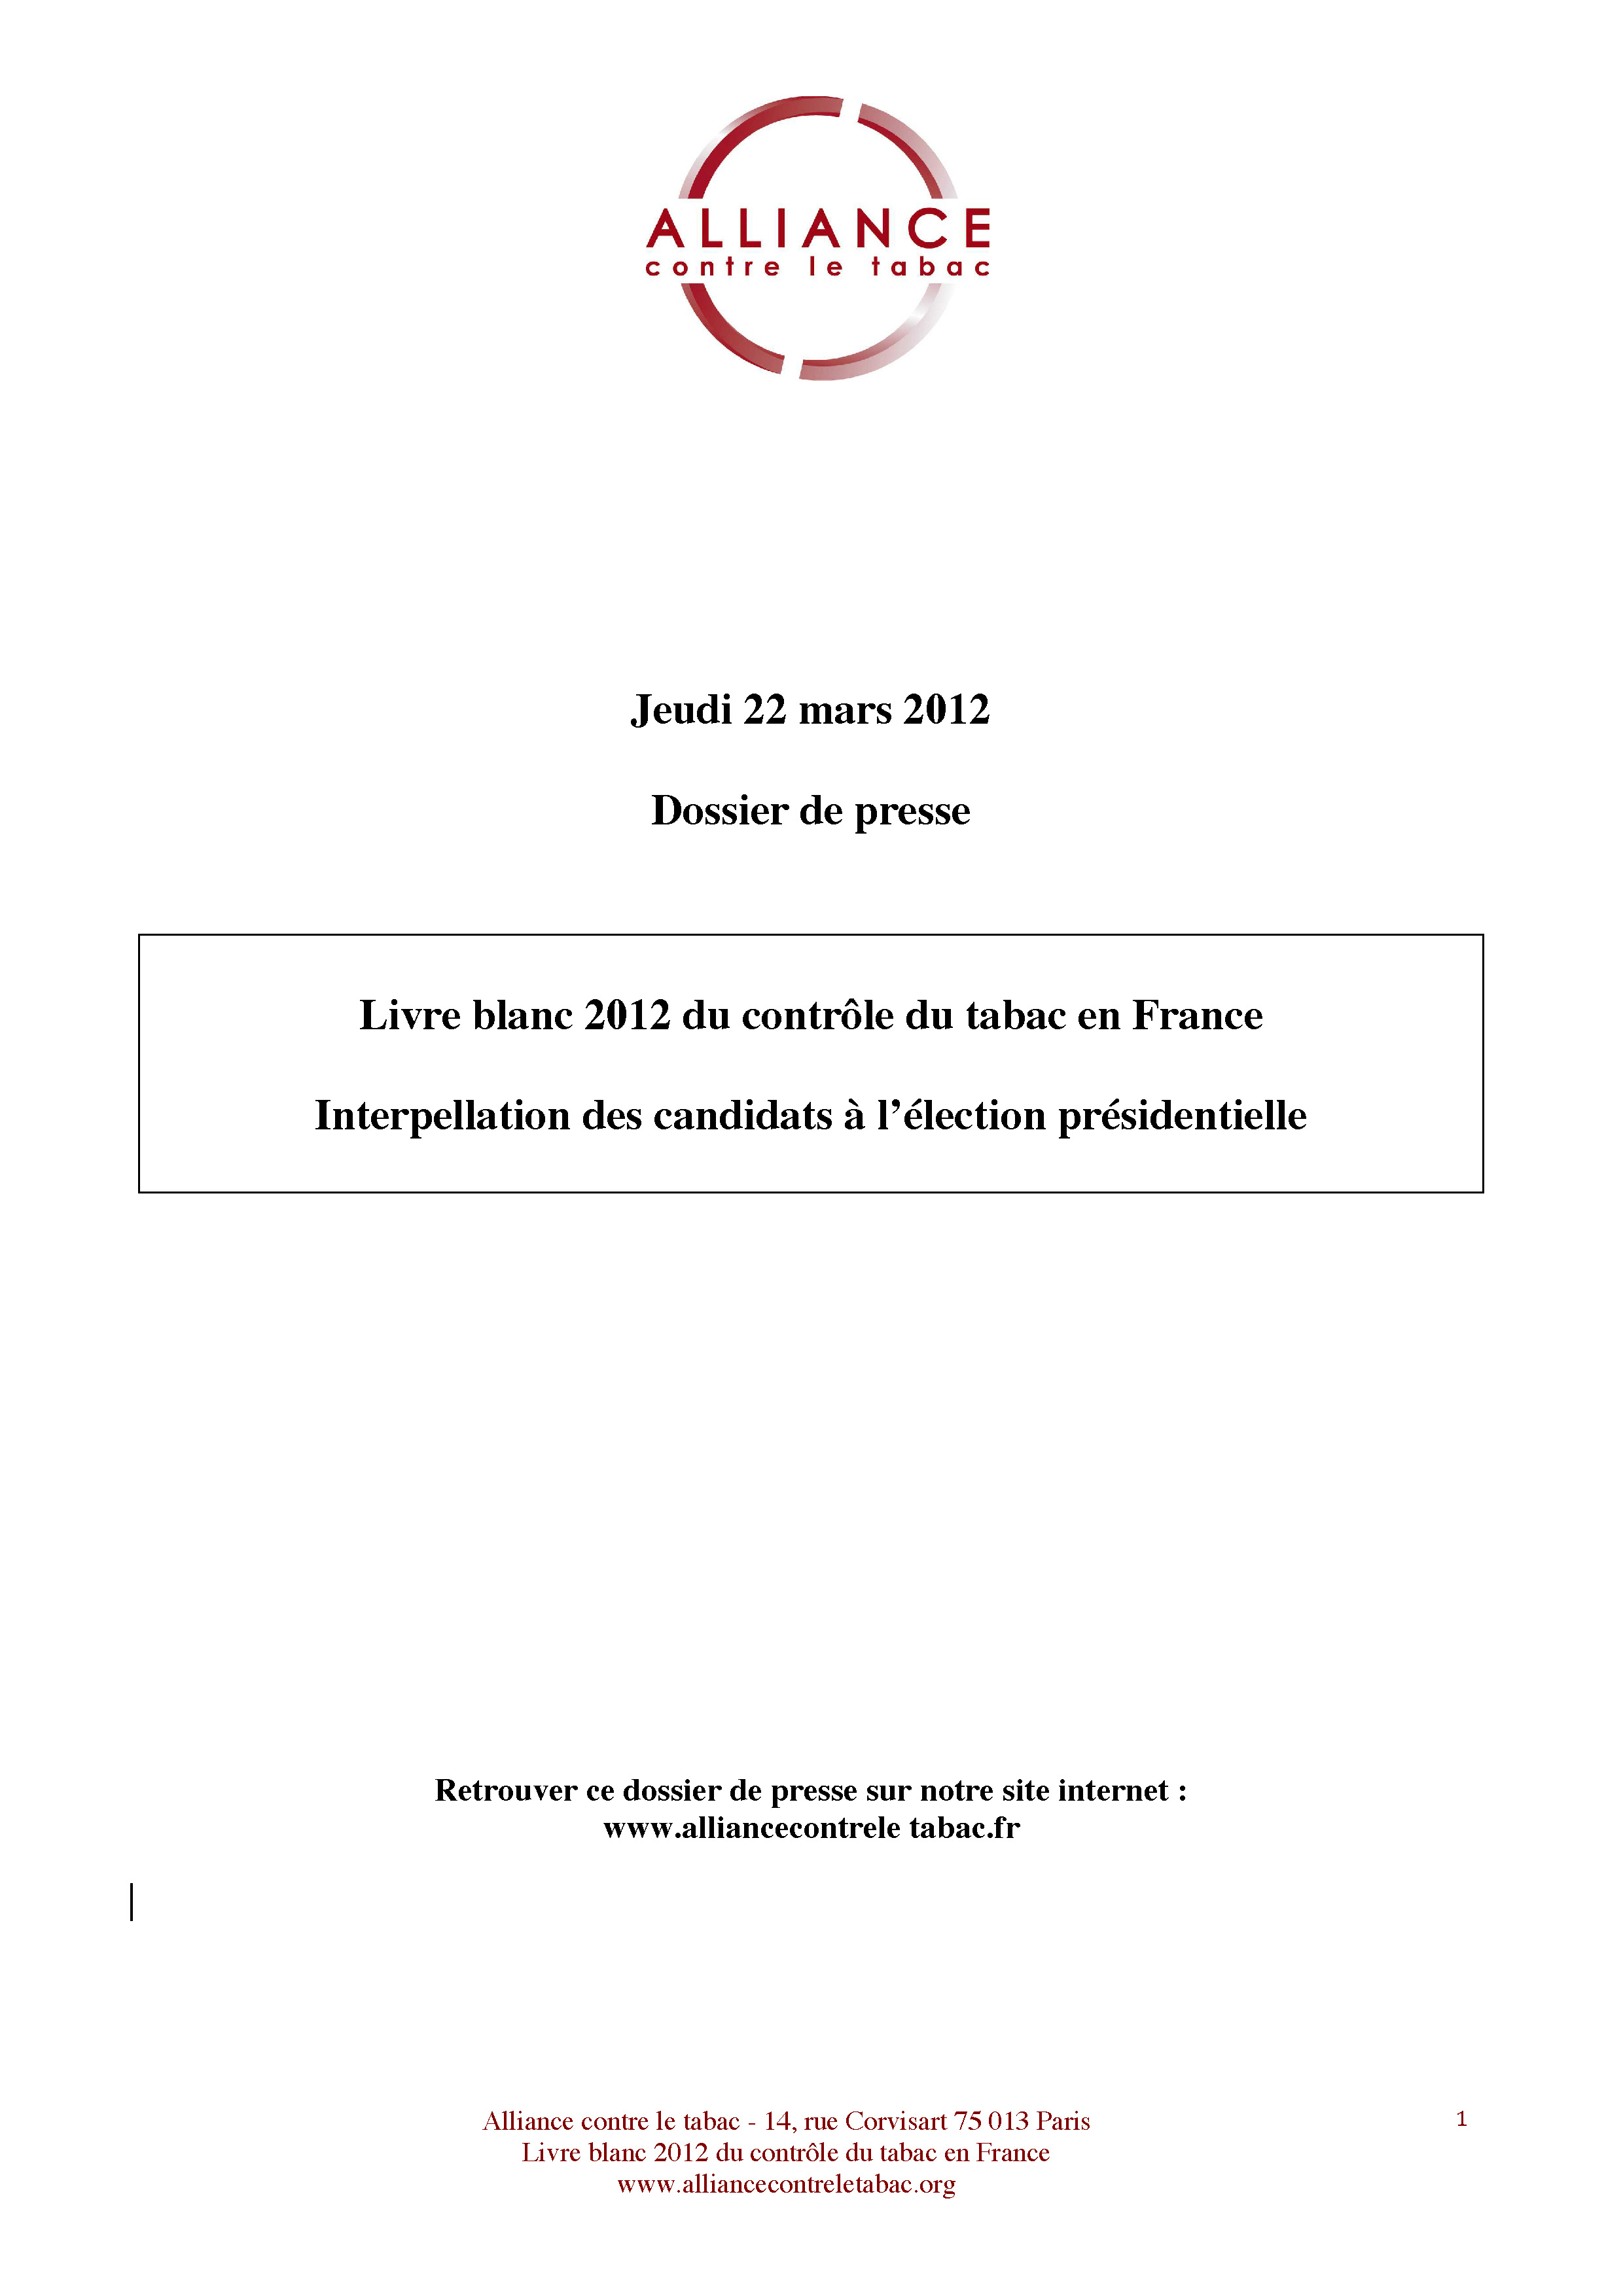 Alliance-dossier-presse_livre-blanc-22mars2012_Page_01.jpg